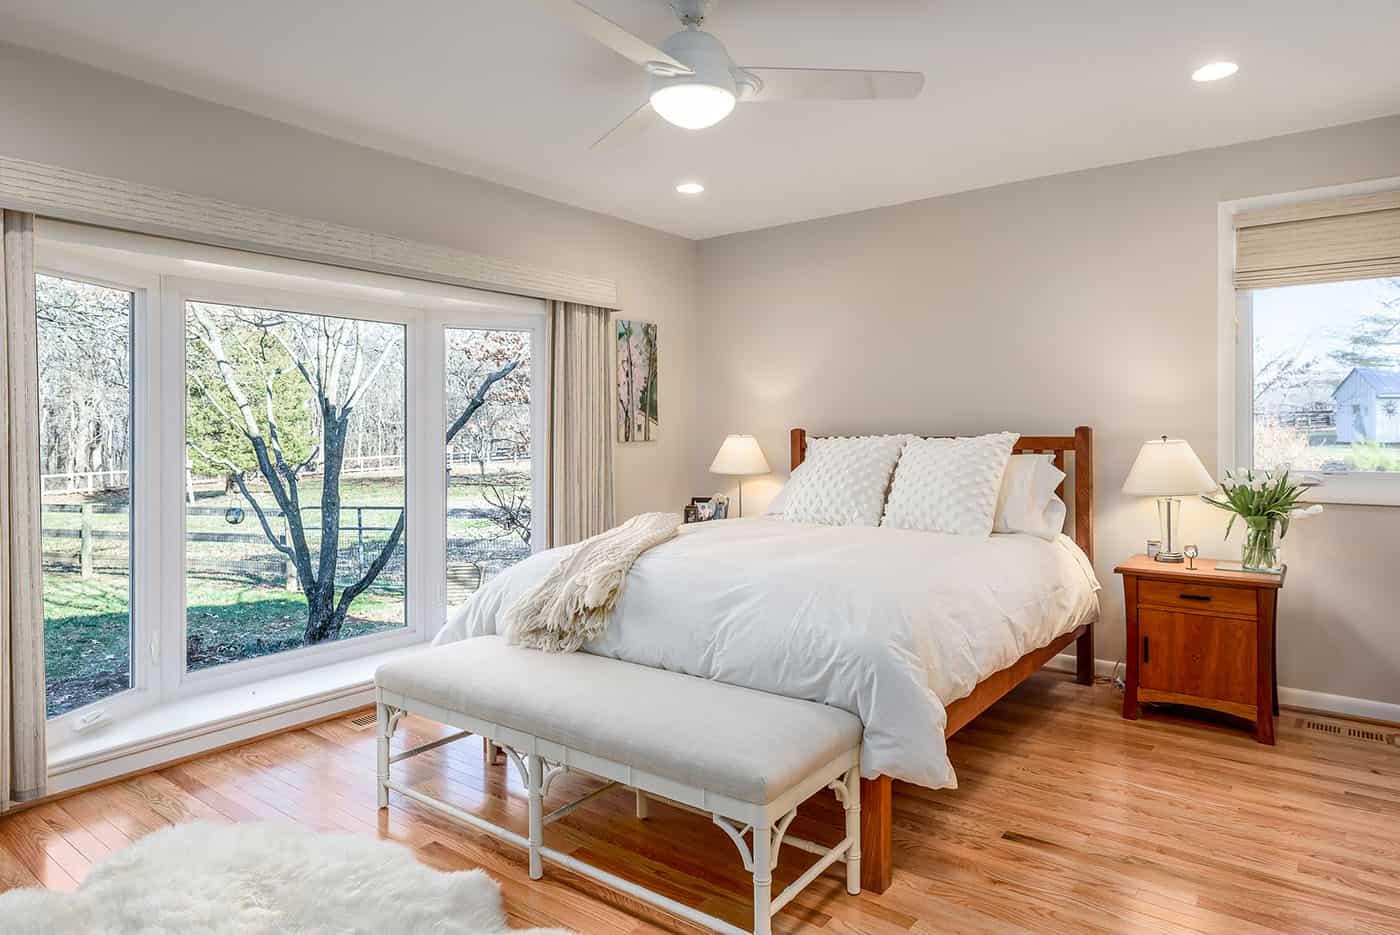 Bay window in master bedroom after renovation